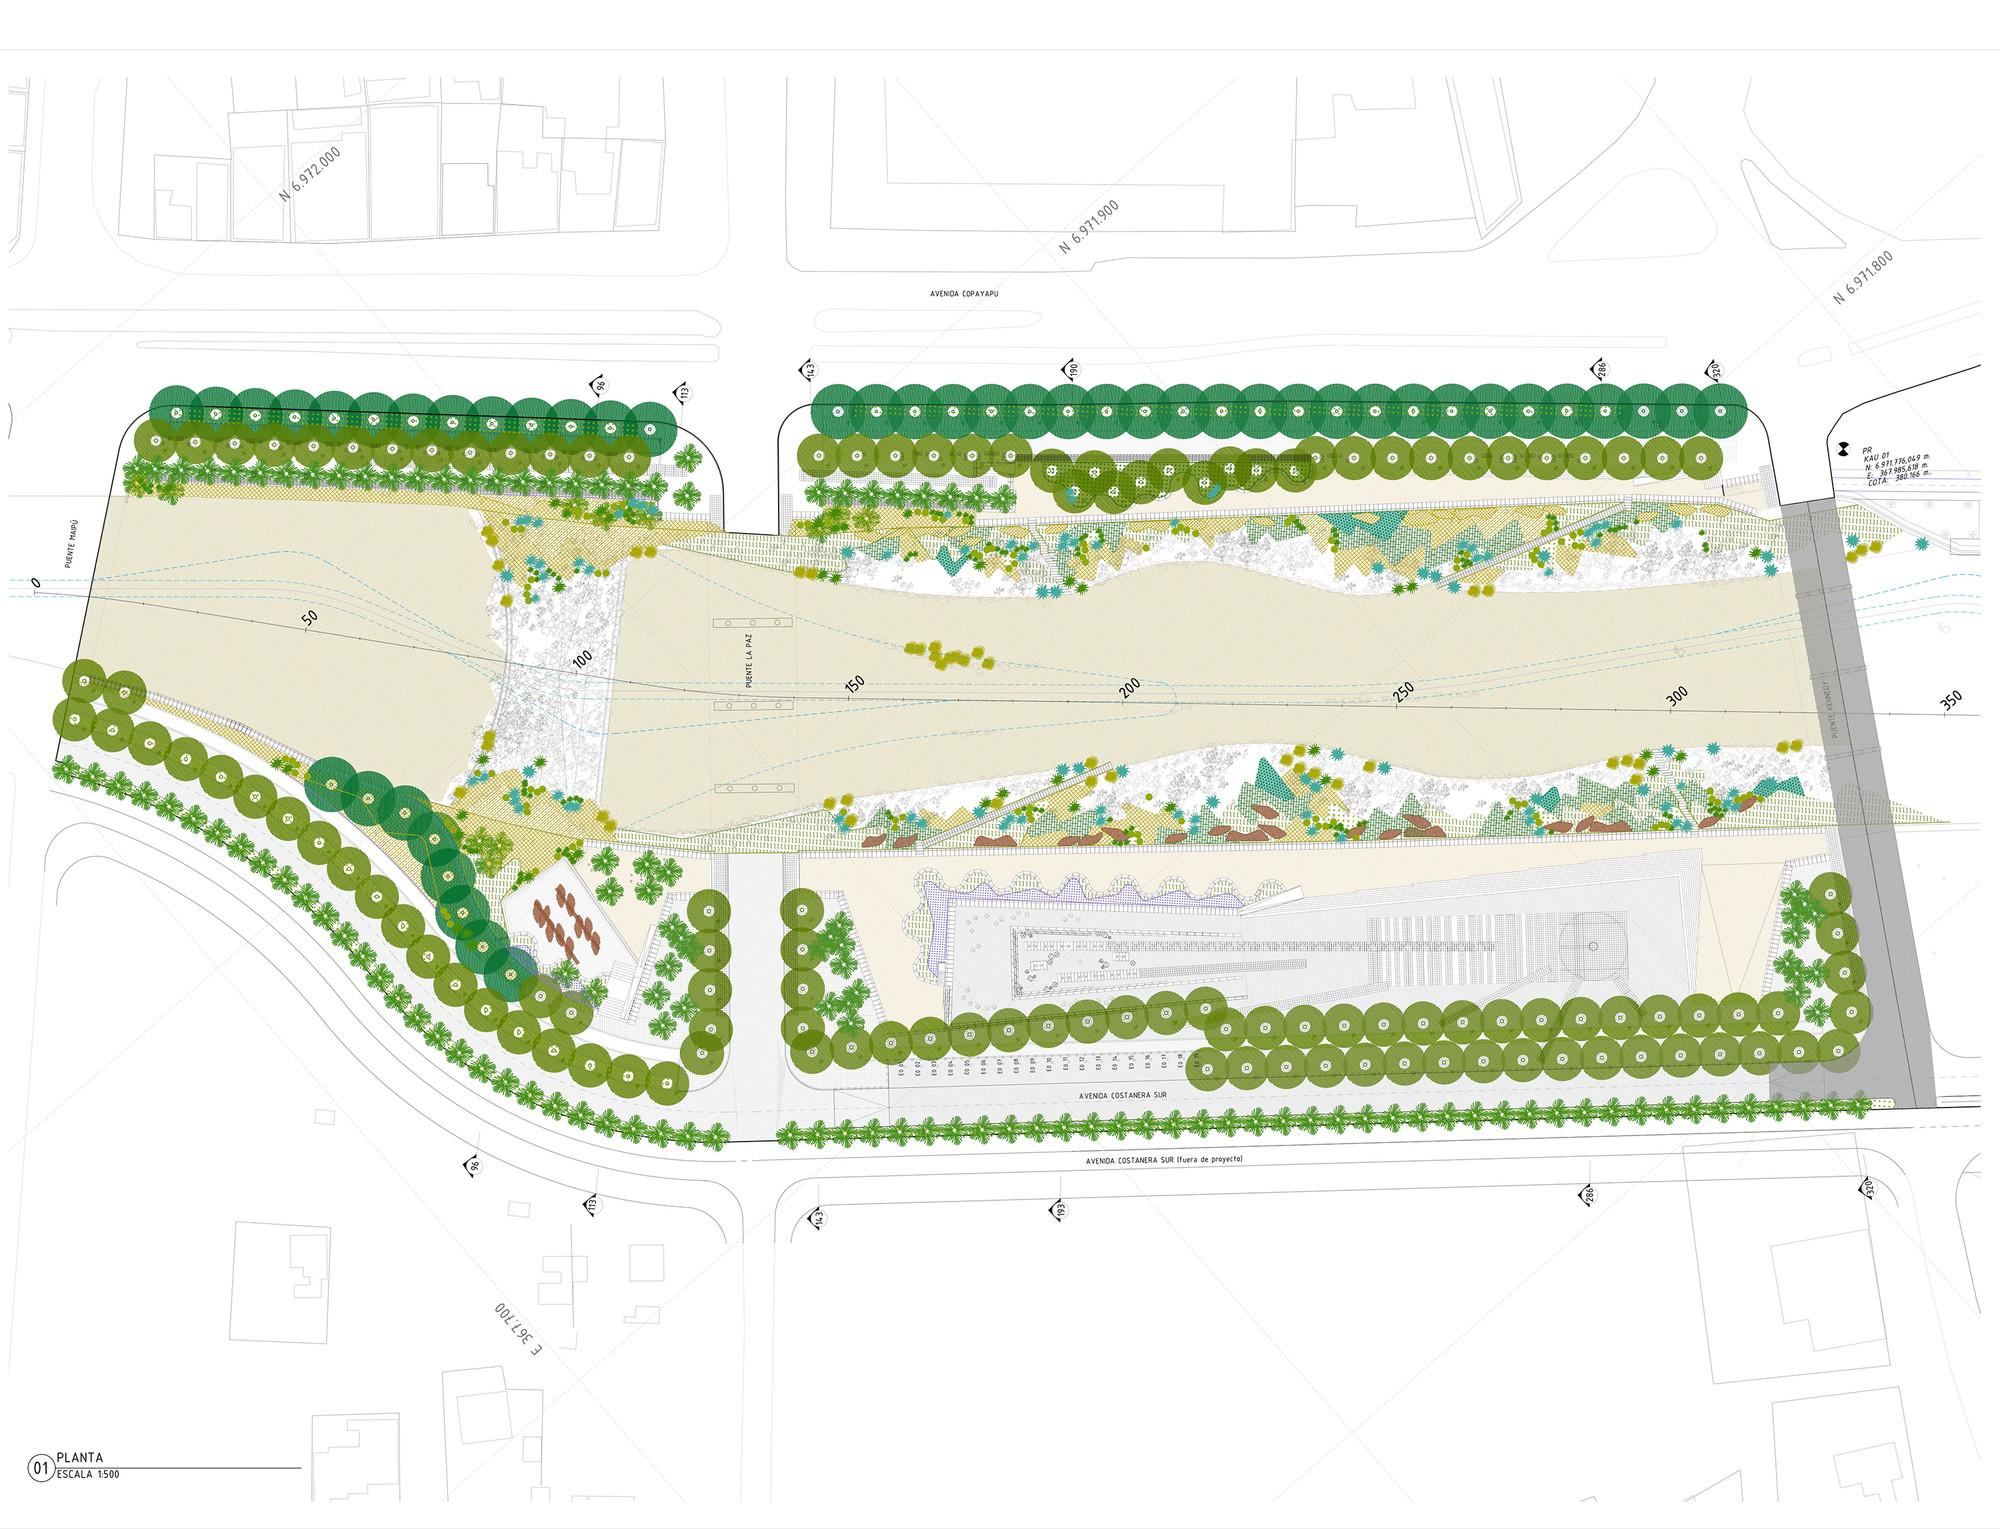 Galeria de parque urbano kaukari teodoro fern ndez for Plantas ornamentales para parques